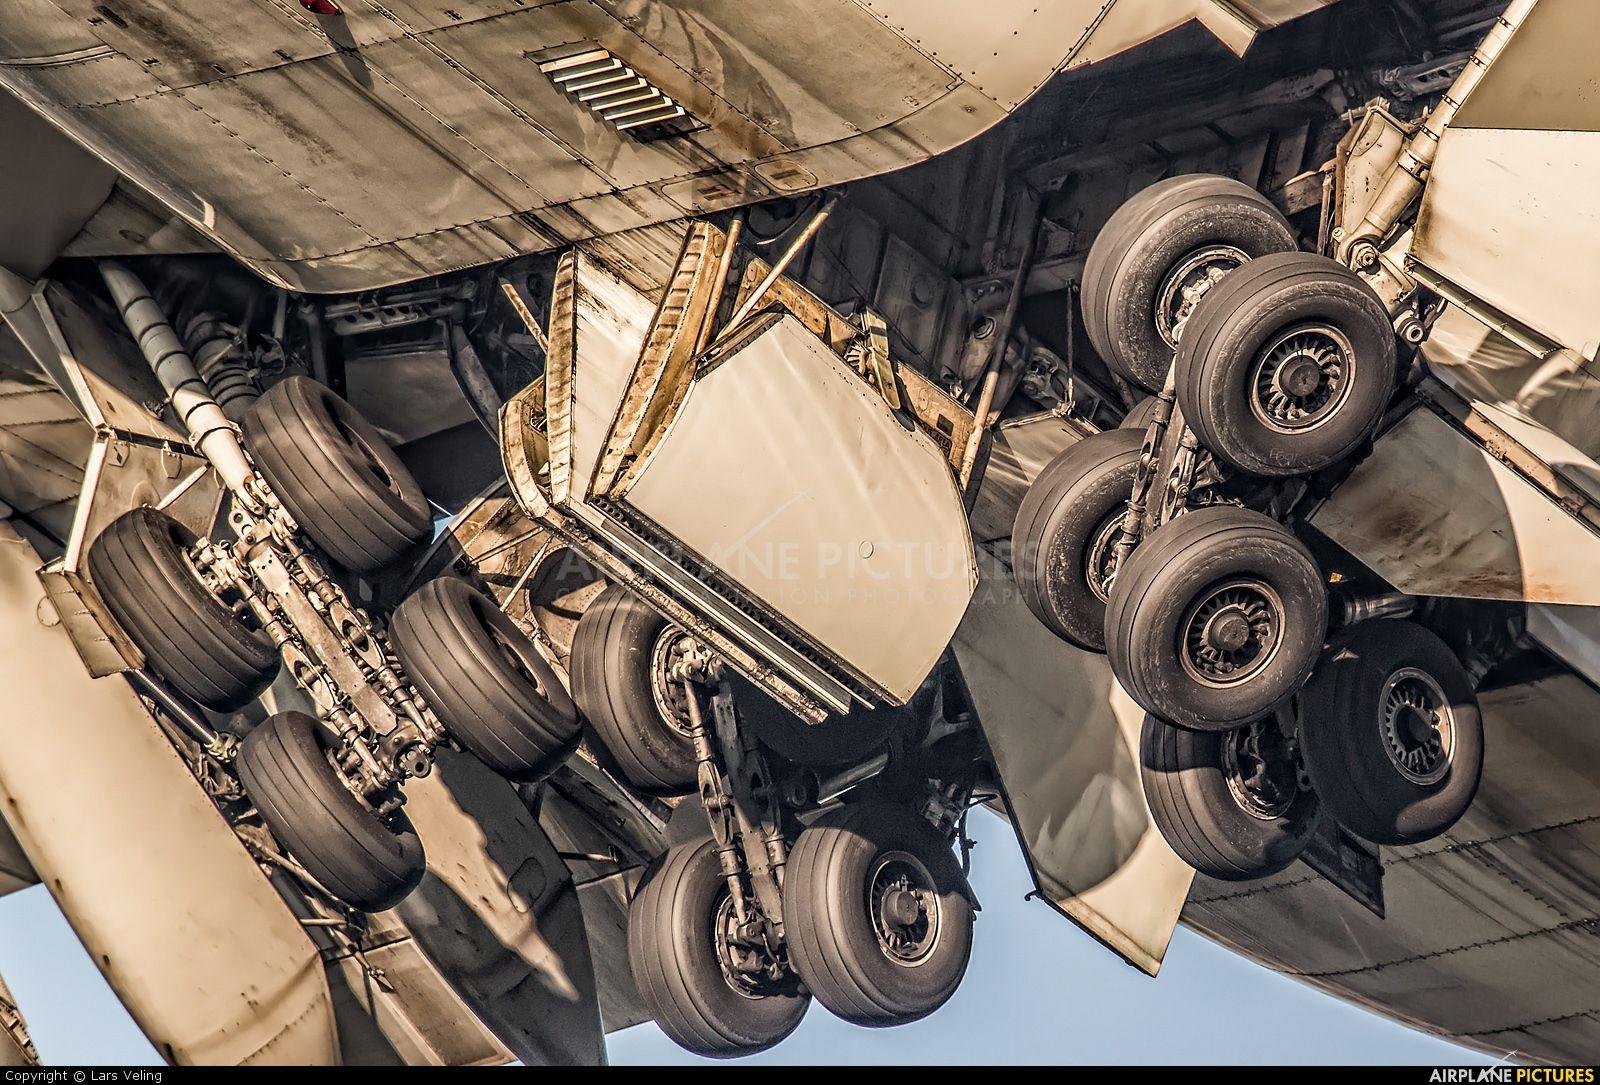 KLM PH-BFI aircraft at Amsterdam - Schiphol photo